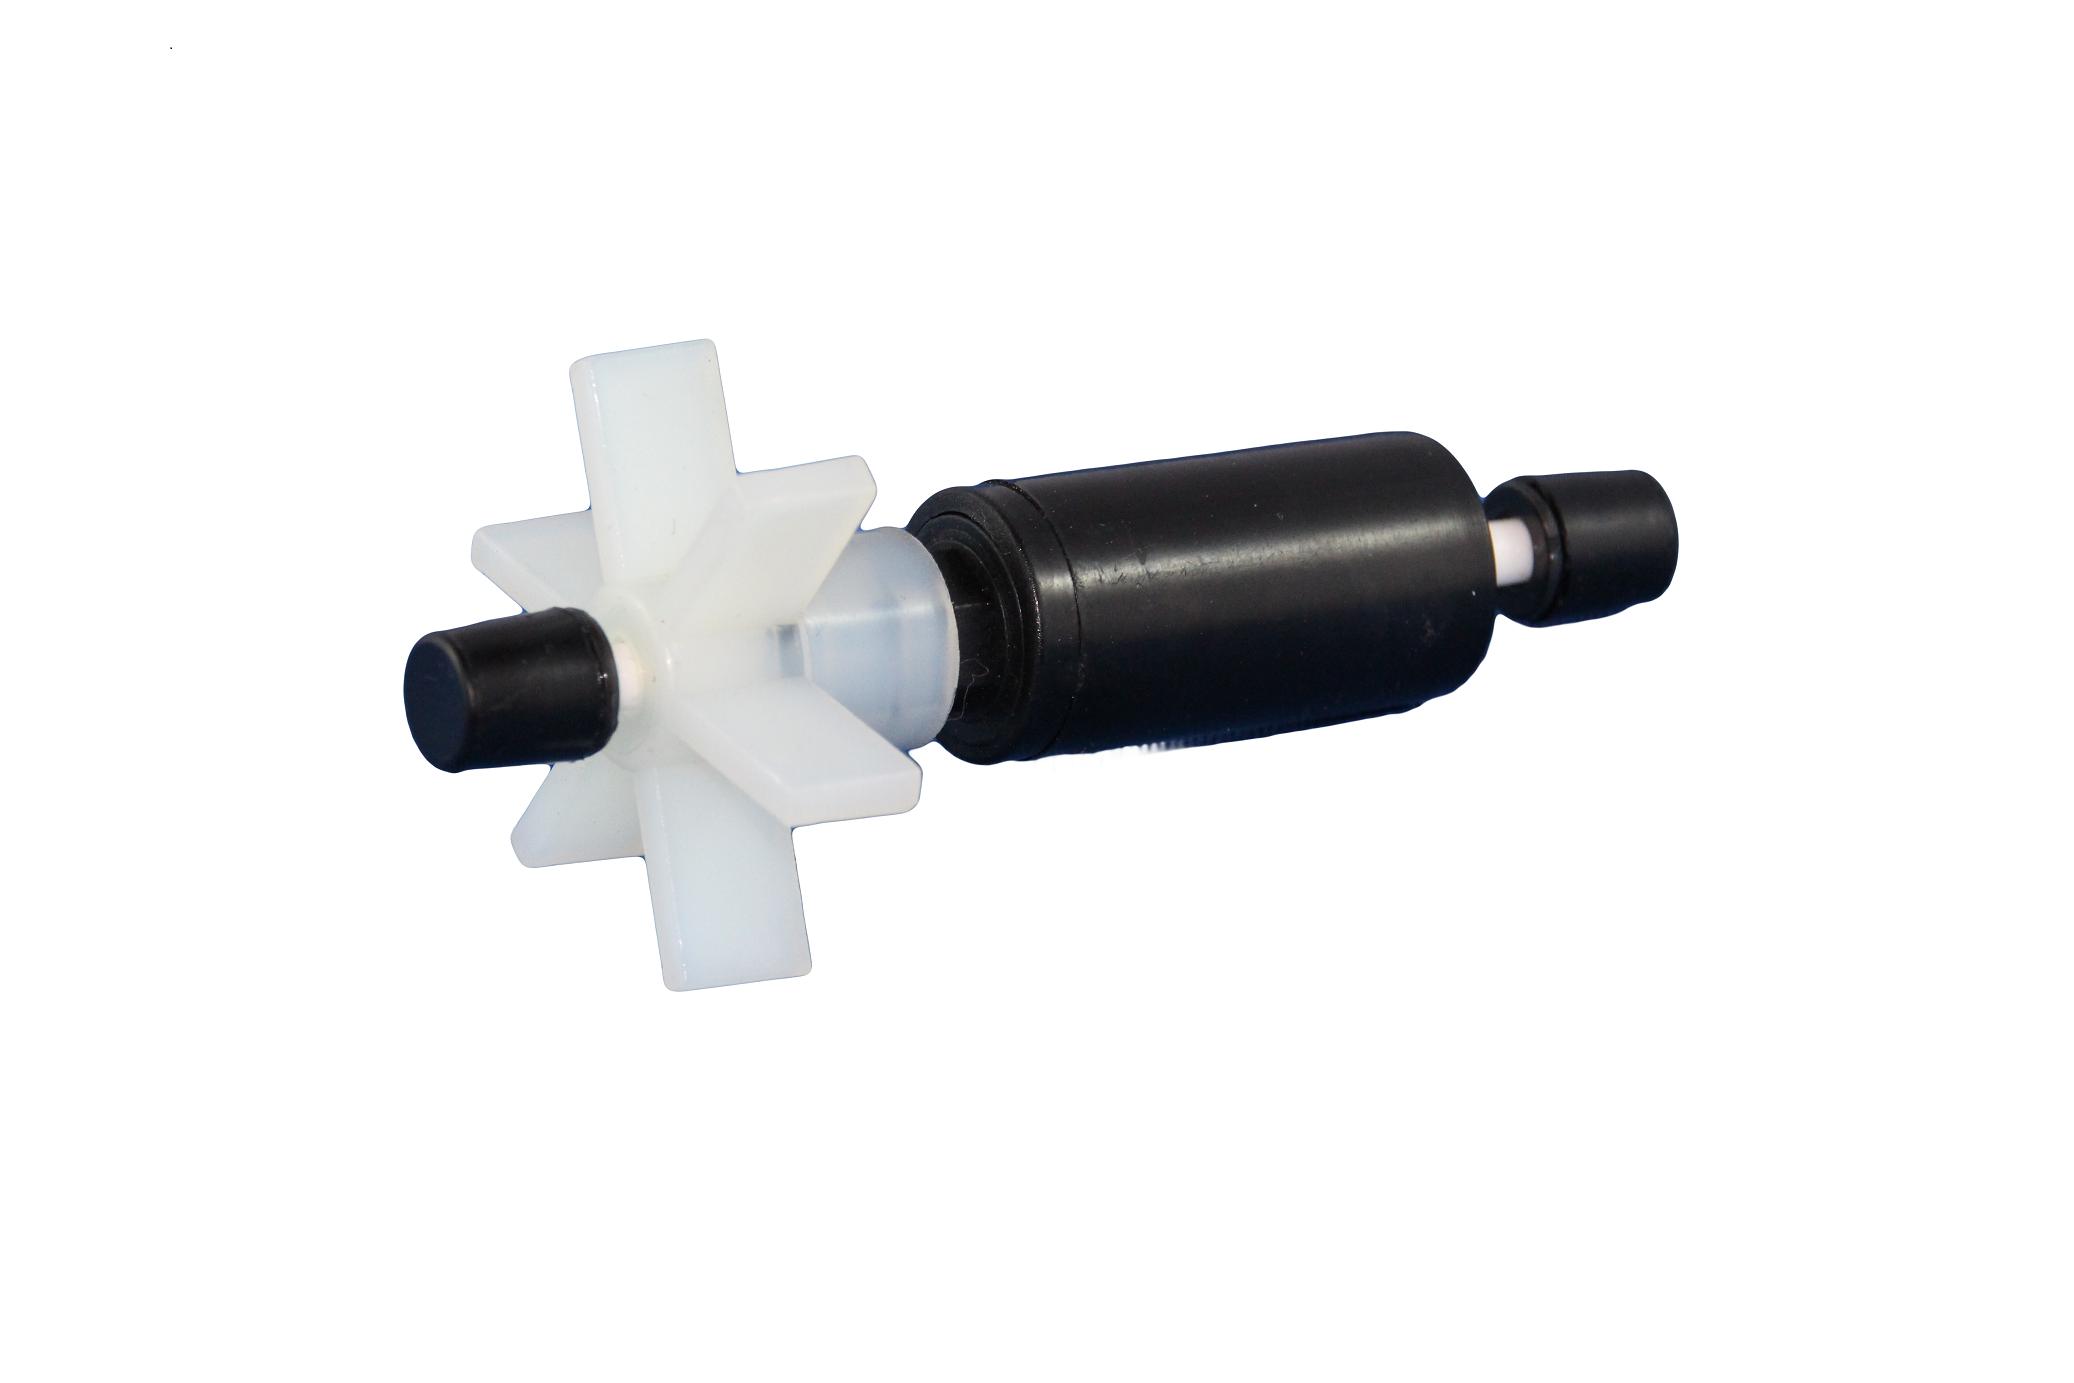 impellar and shaft for jet plus internal filter